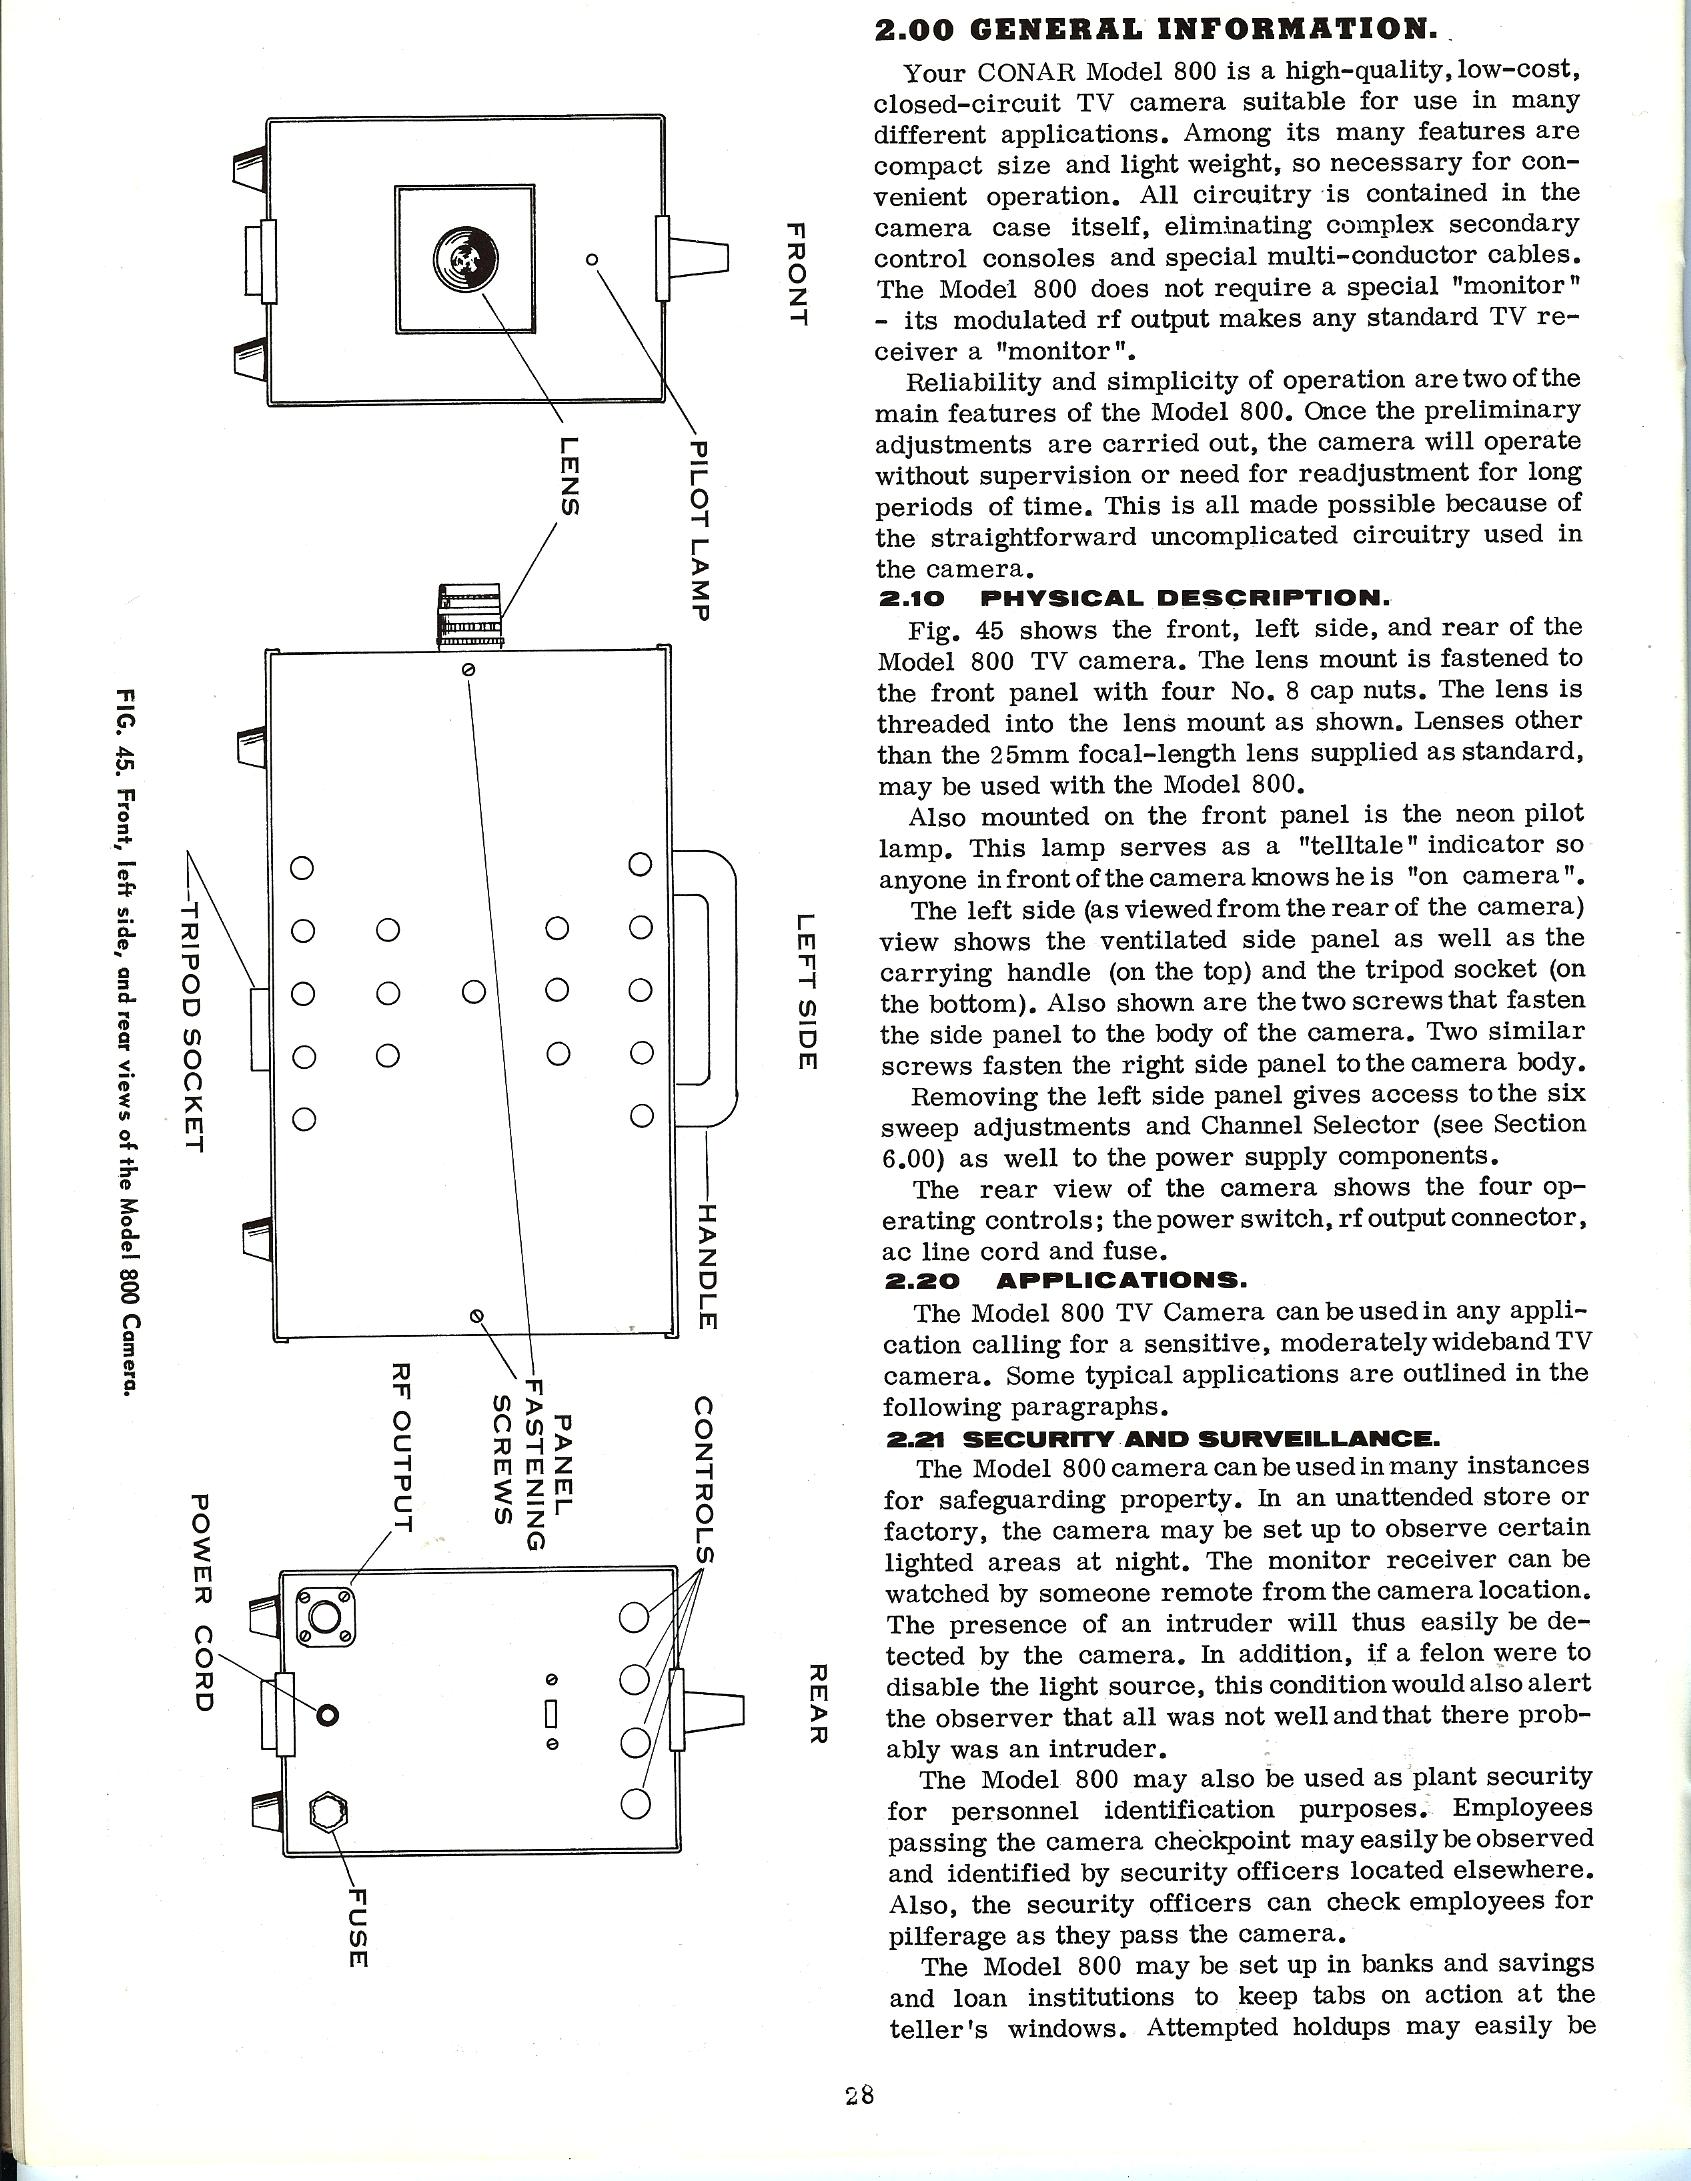 conar 800 camera manual and instructions smecc